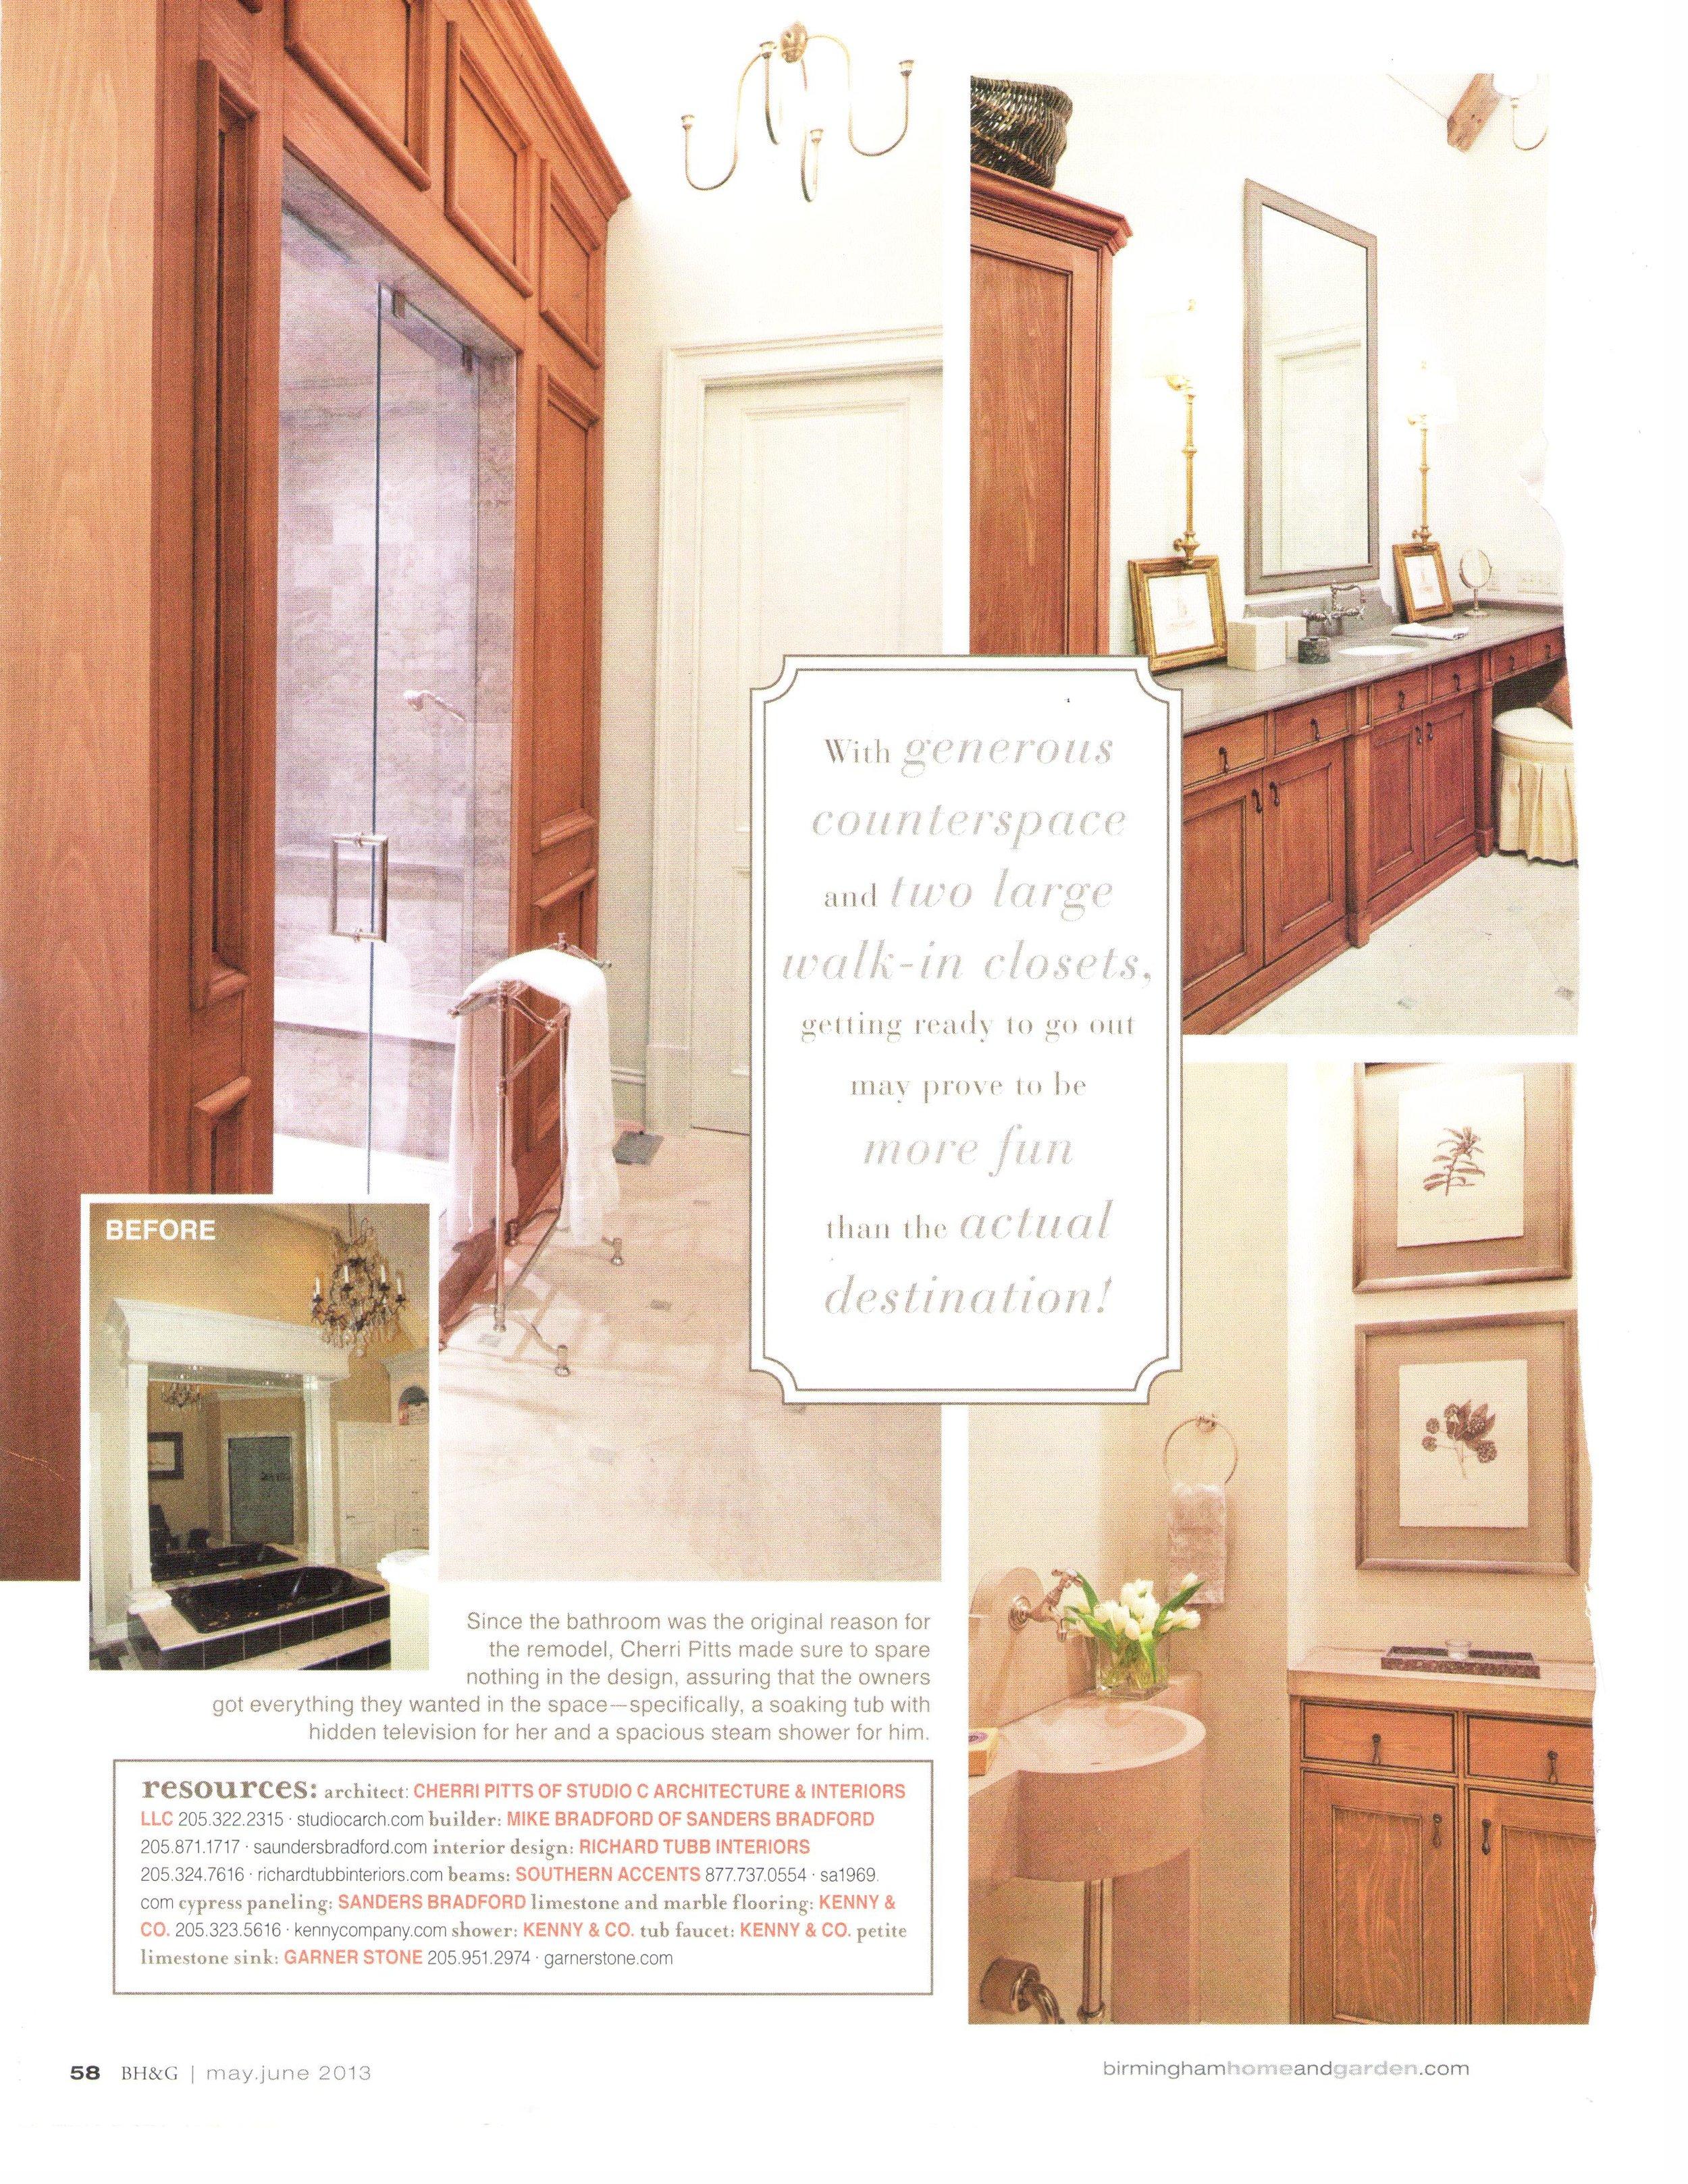 B'Ham Home & Garden Suite Upgrade magazine page 3 architecture exterior and interior design